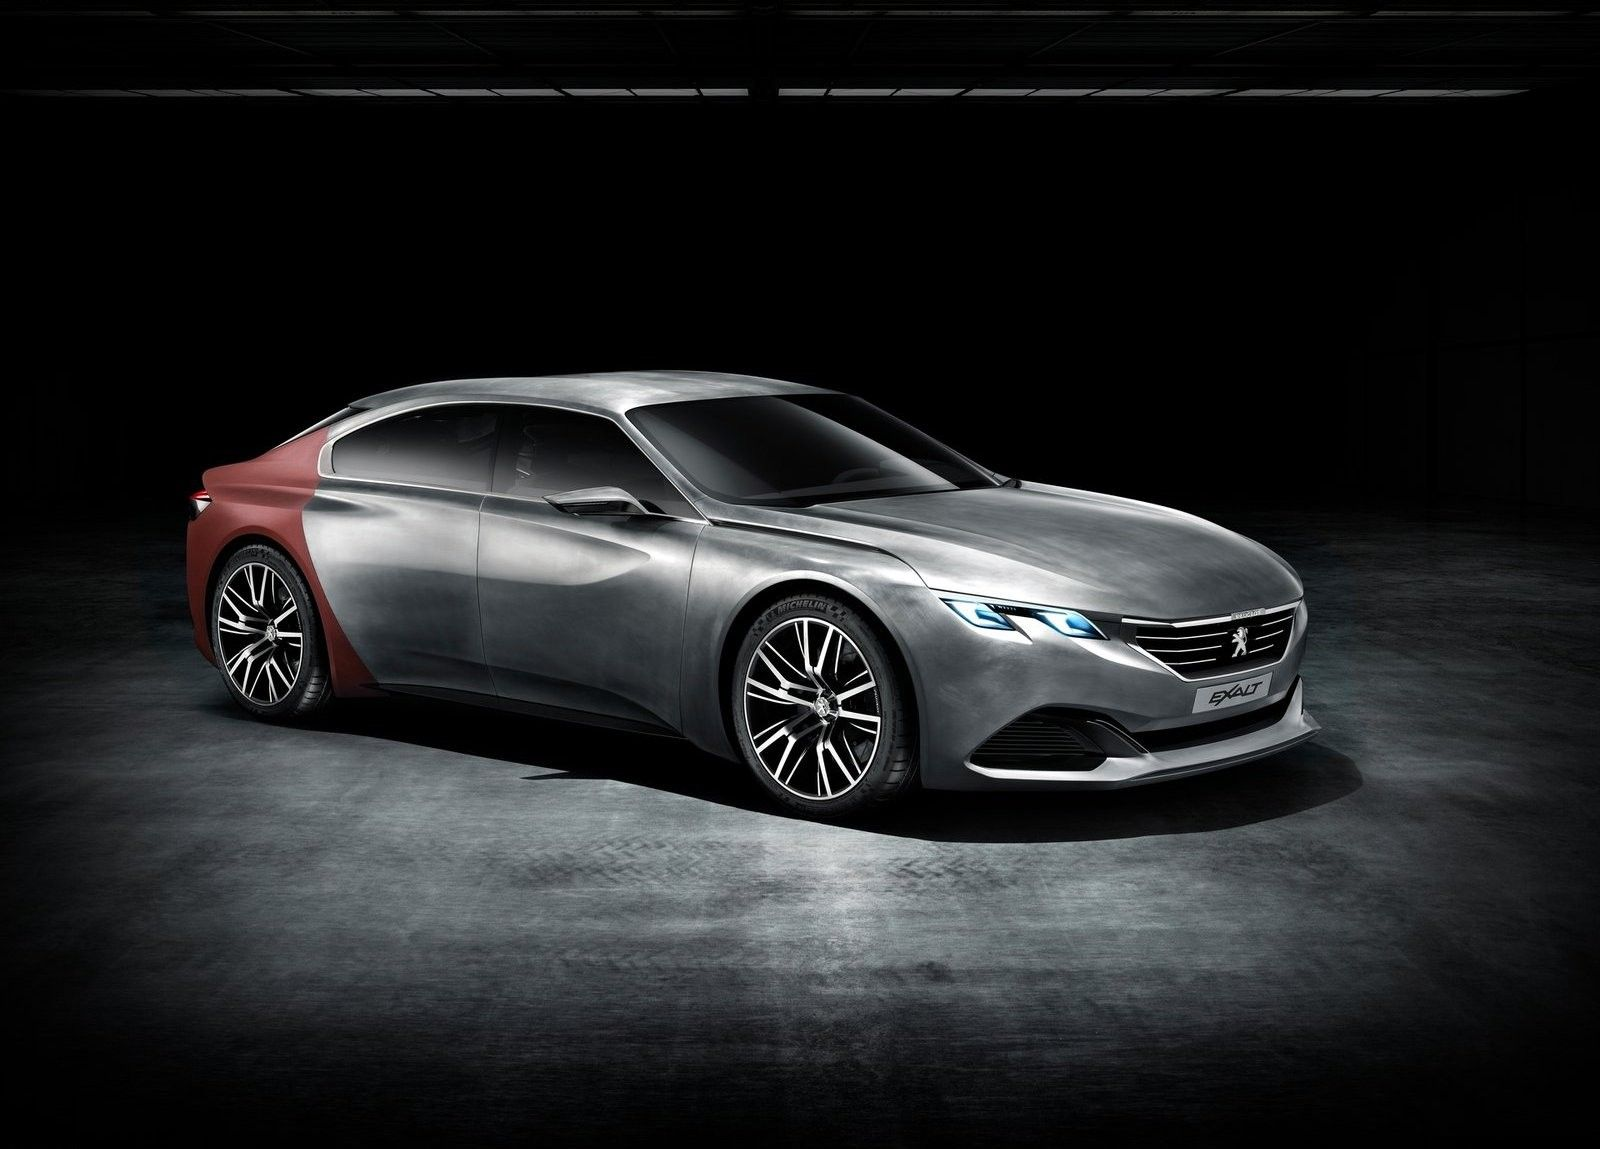 Peugeot Exalt - 2014 Sharkskin